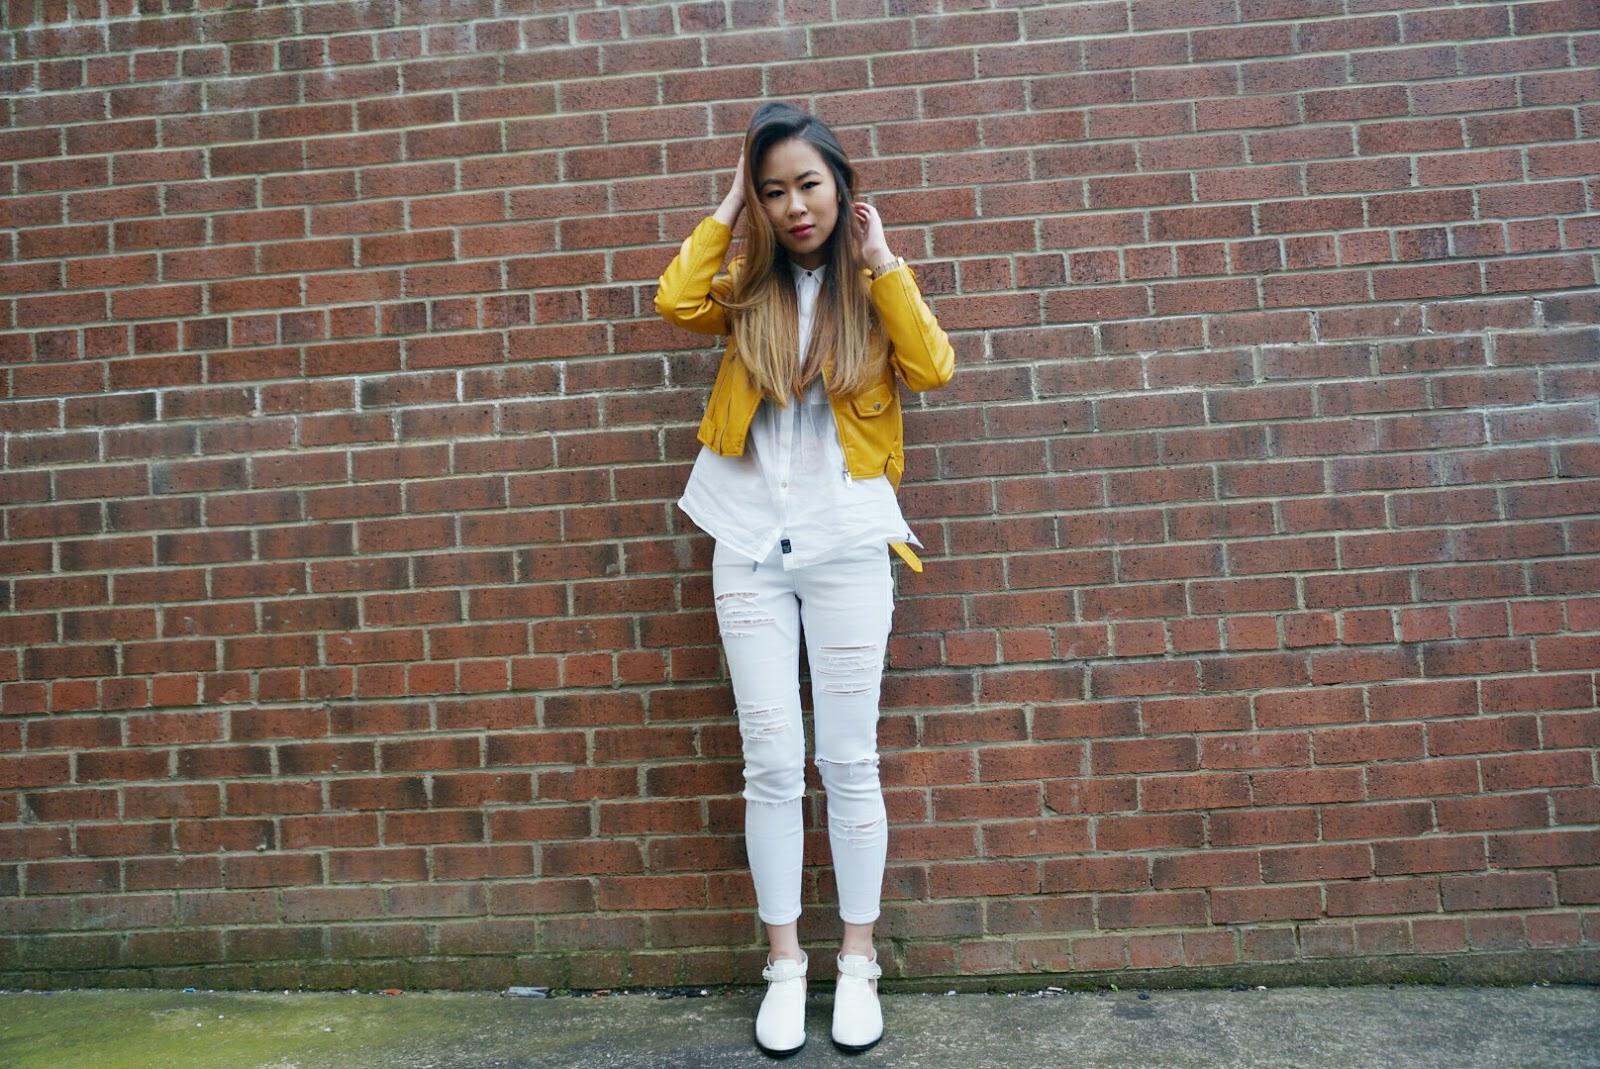 Leather jacket yellow zara - Zara Leather Jacket Replay Shirt Asos Ridley Jeans Senso Qimat Booties